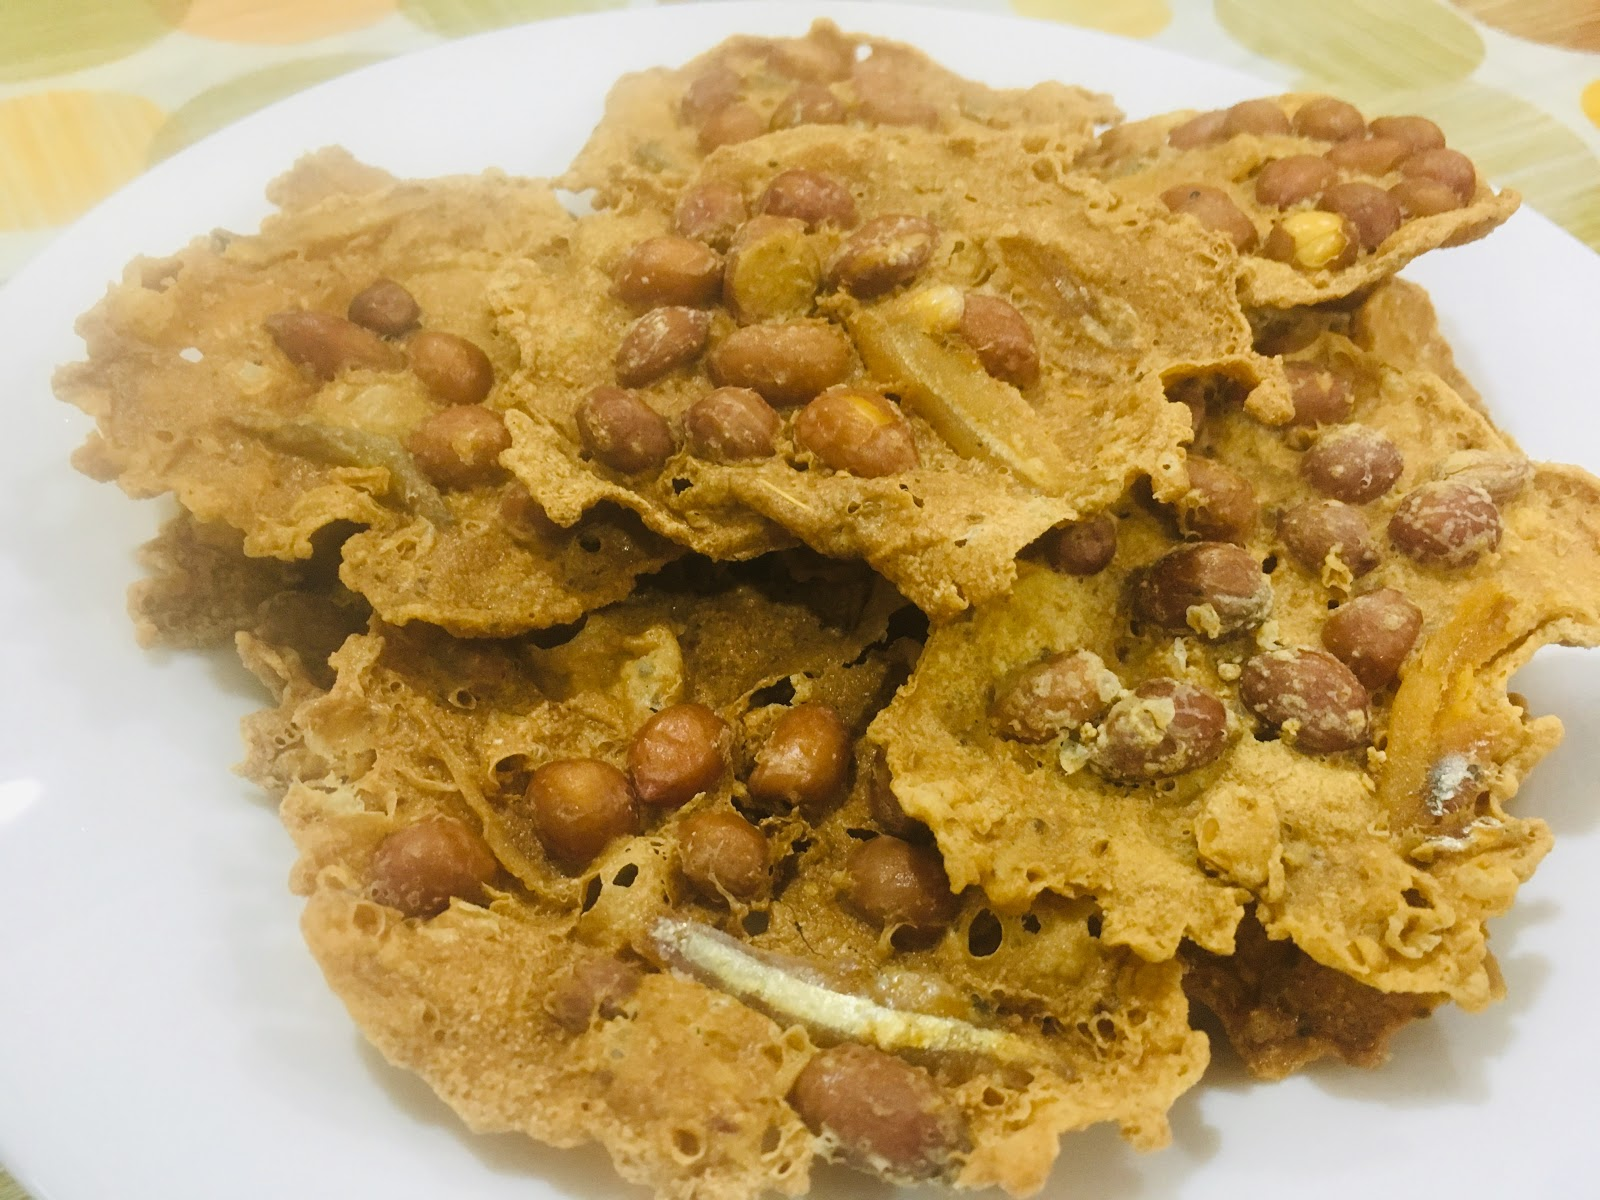 rempeyek kacang tanah asli  rangup berempah   sedap  resepi sukatan cawan Resepi Biskut Kacang Tanah Sukatan Cawan Enak dan Mudah